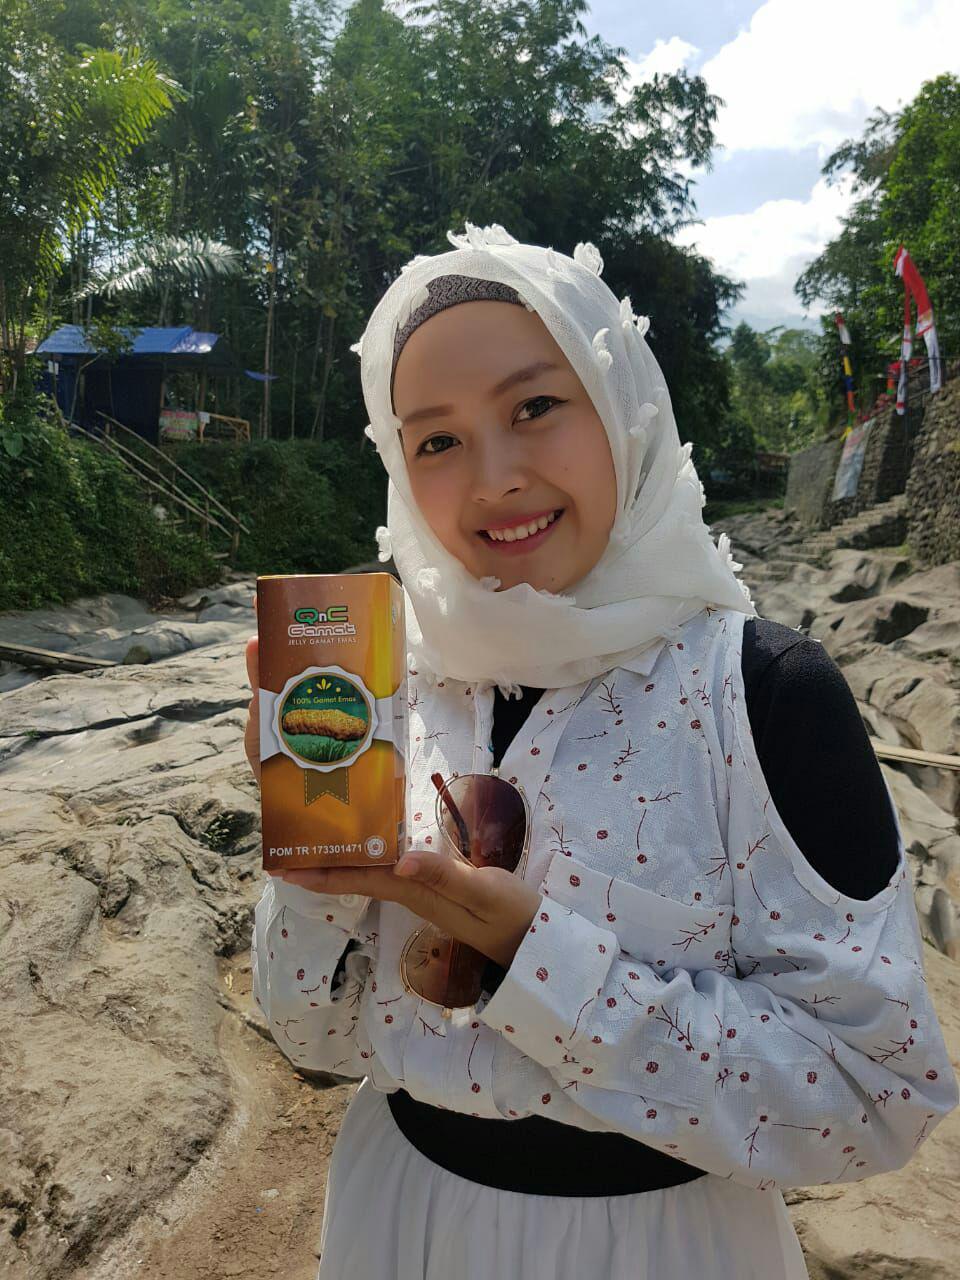 Buy Sell Cheapest Qnc Jelli Gamat Best Quality Product Deals Jeli Jely Jelly Agen Jakarta Original 100 Asli Produk Bergaransi Obat Herbal